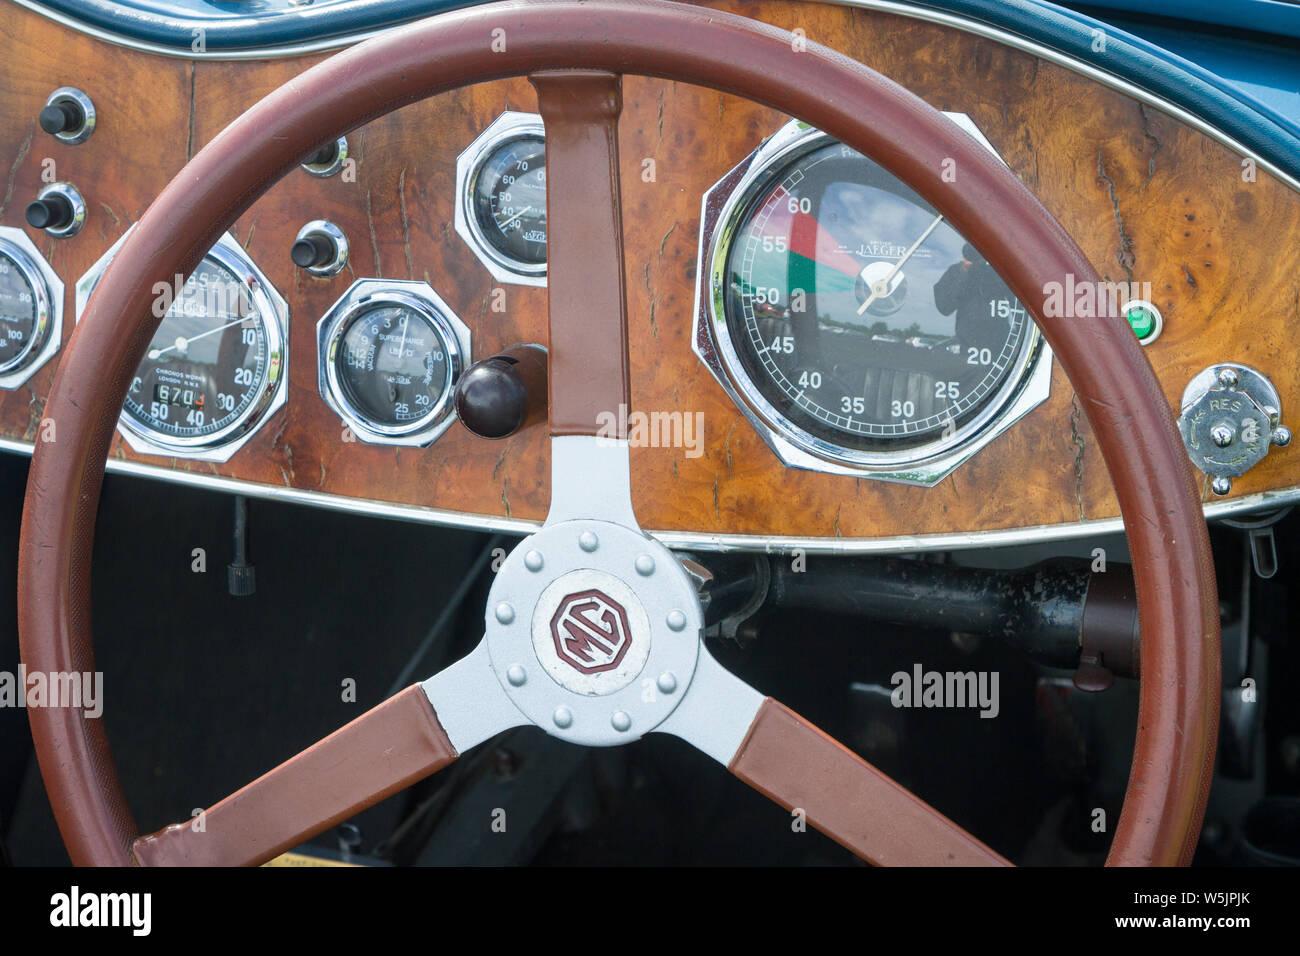 Vintage Car Instruments Stock Photos & Vintage Car